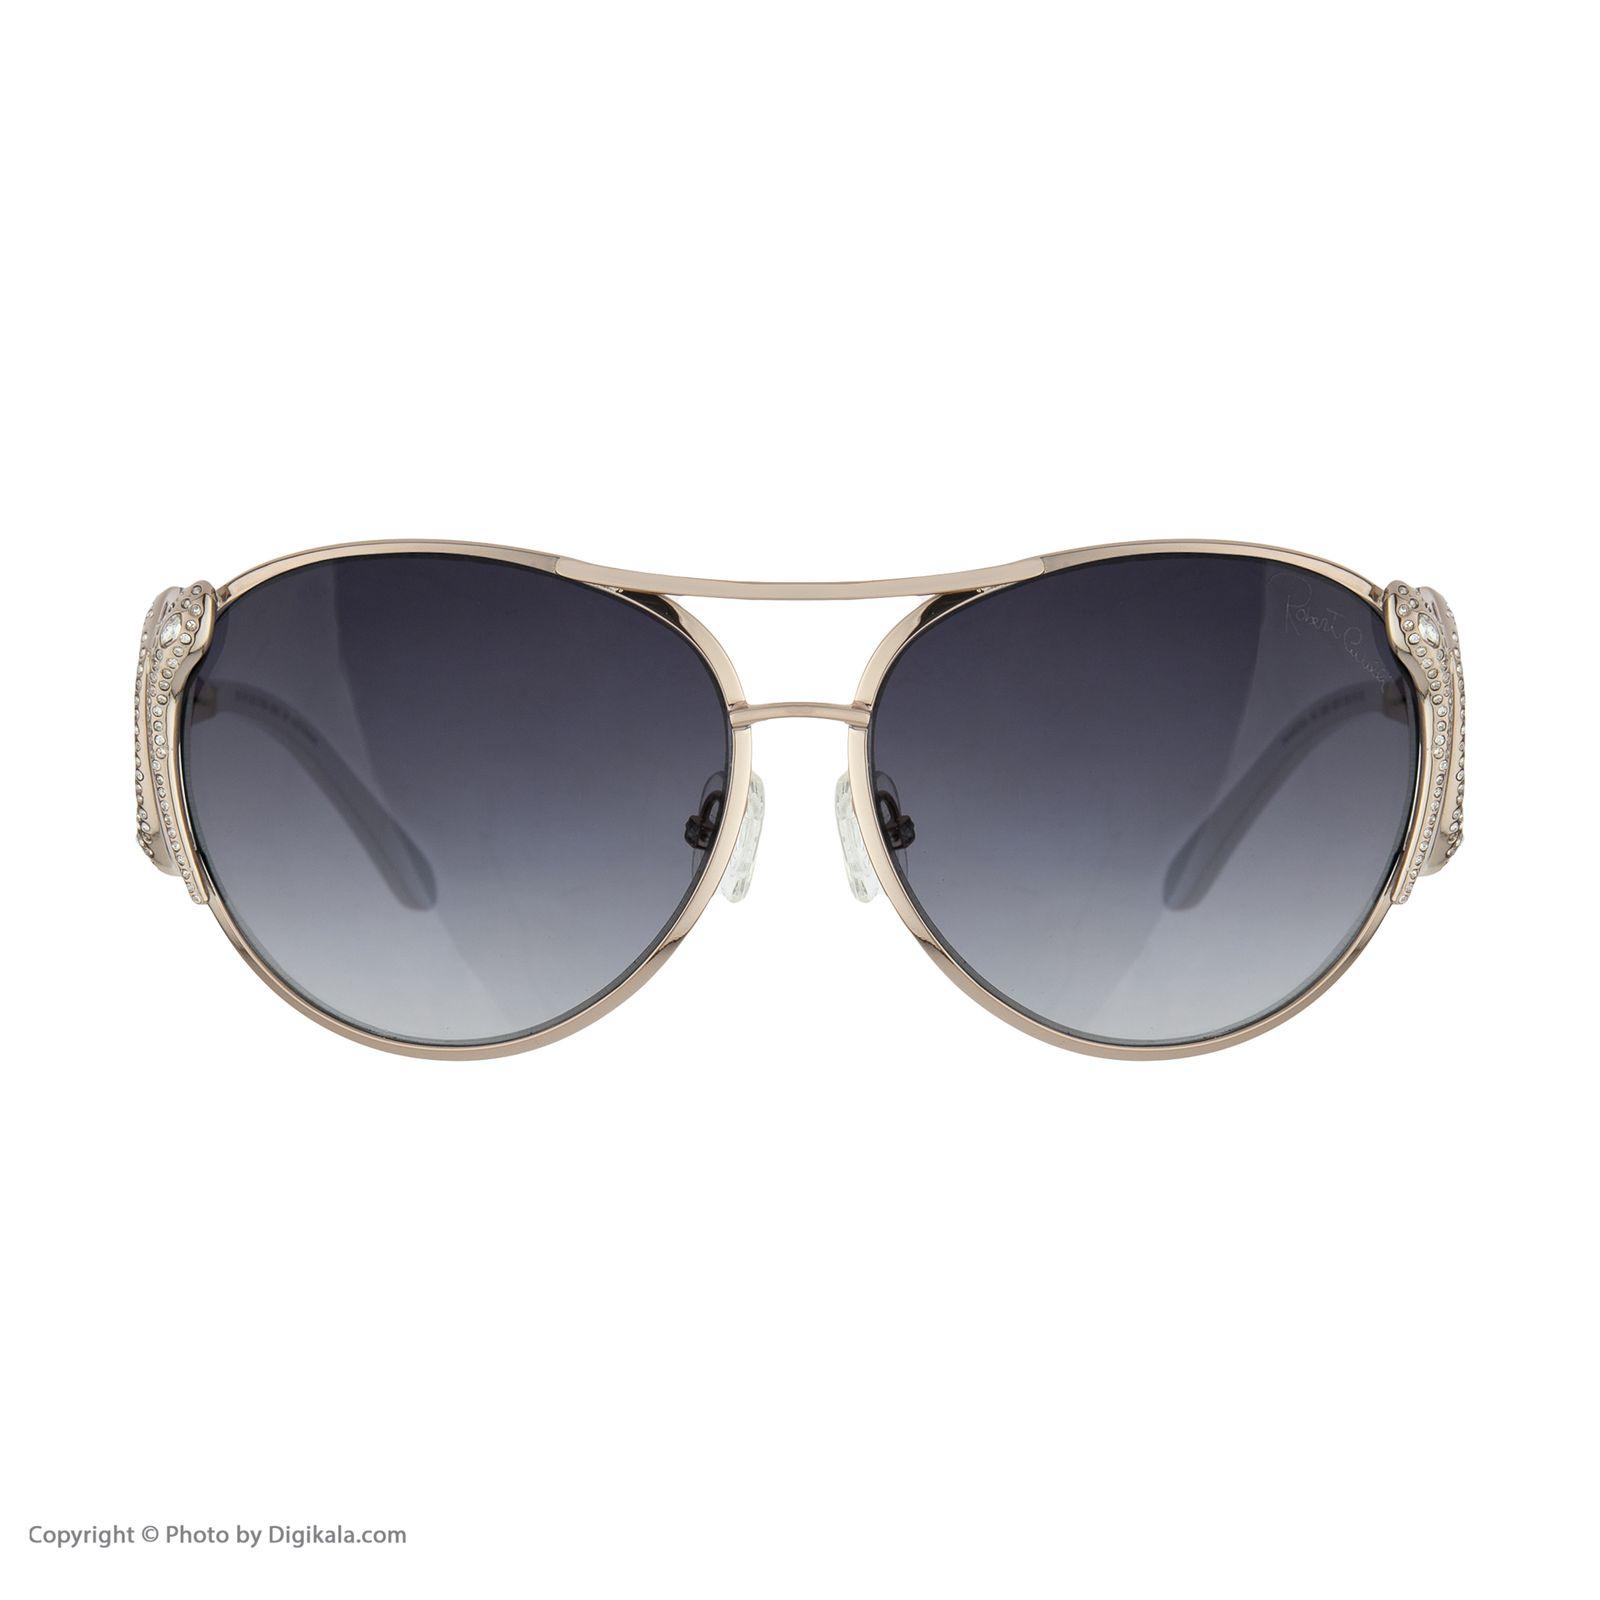 عینک آفتابی زنانه روبرتو کاوالی مدل 909 -  - 3